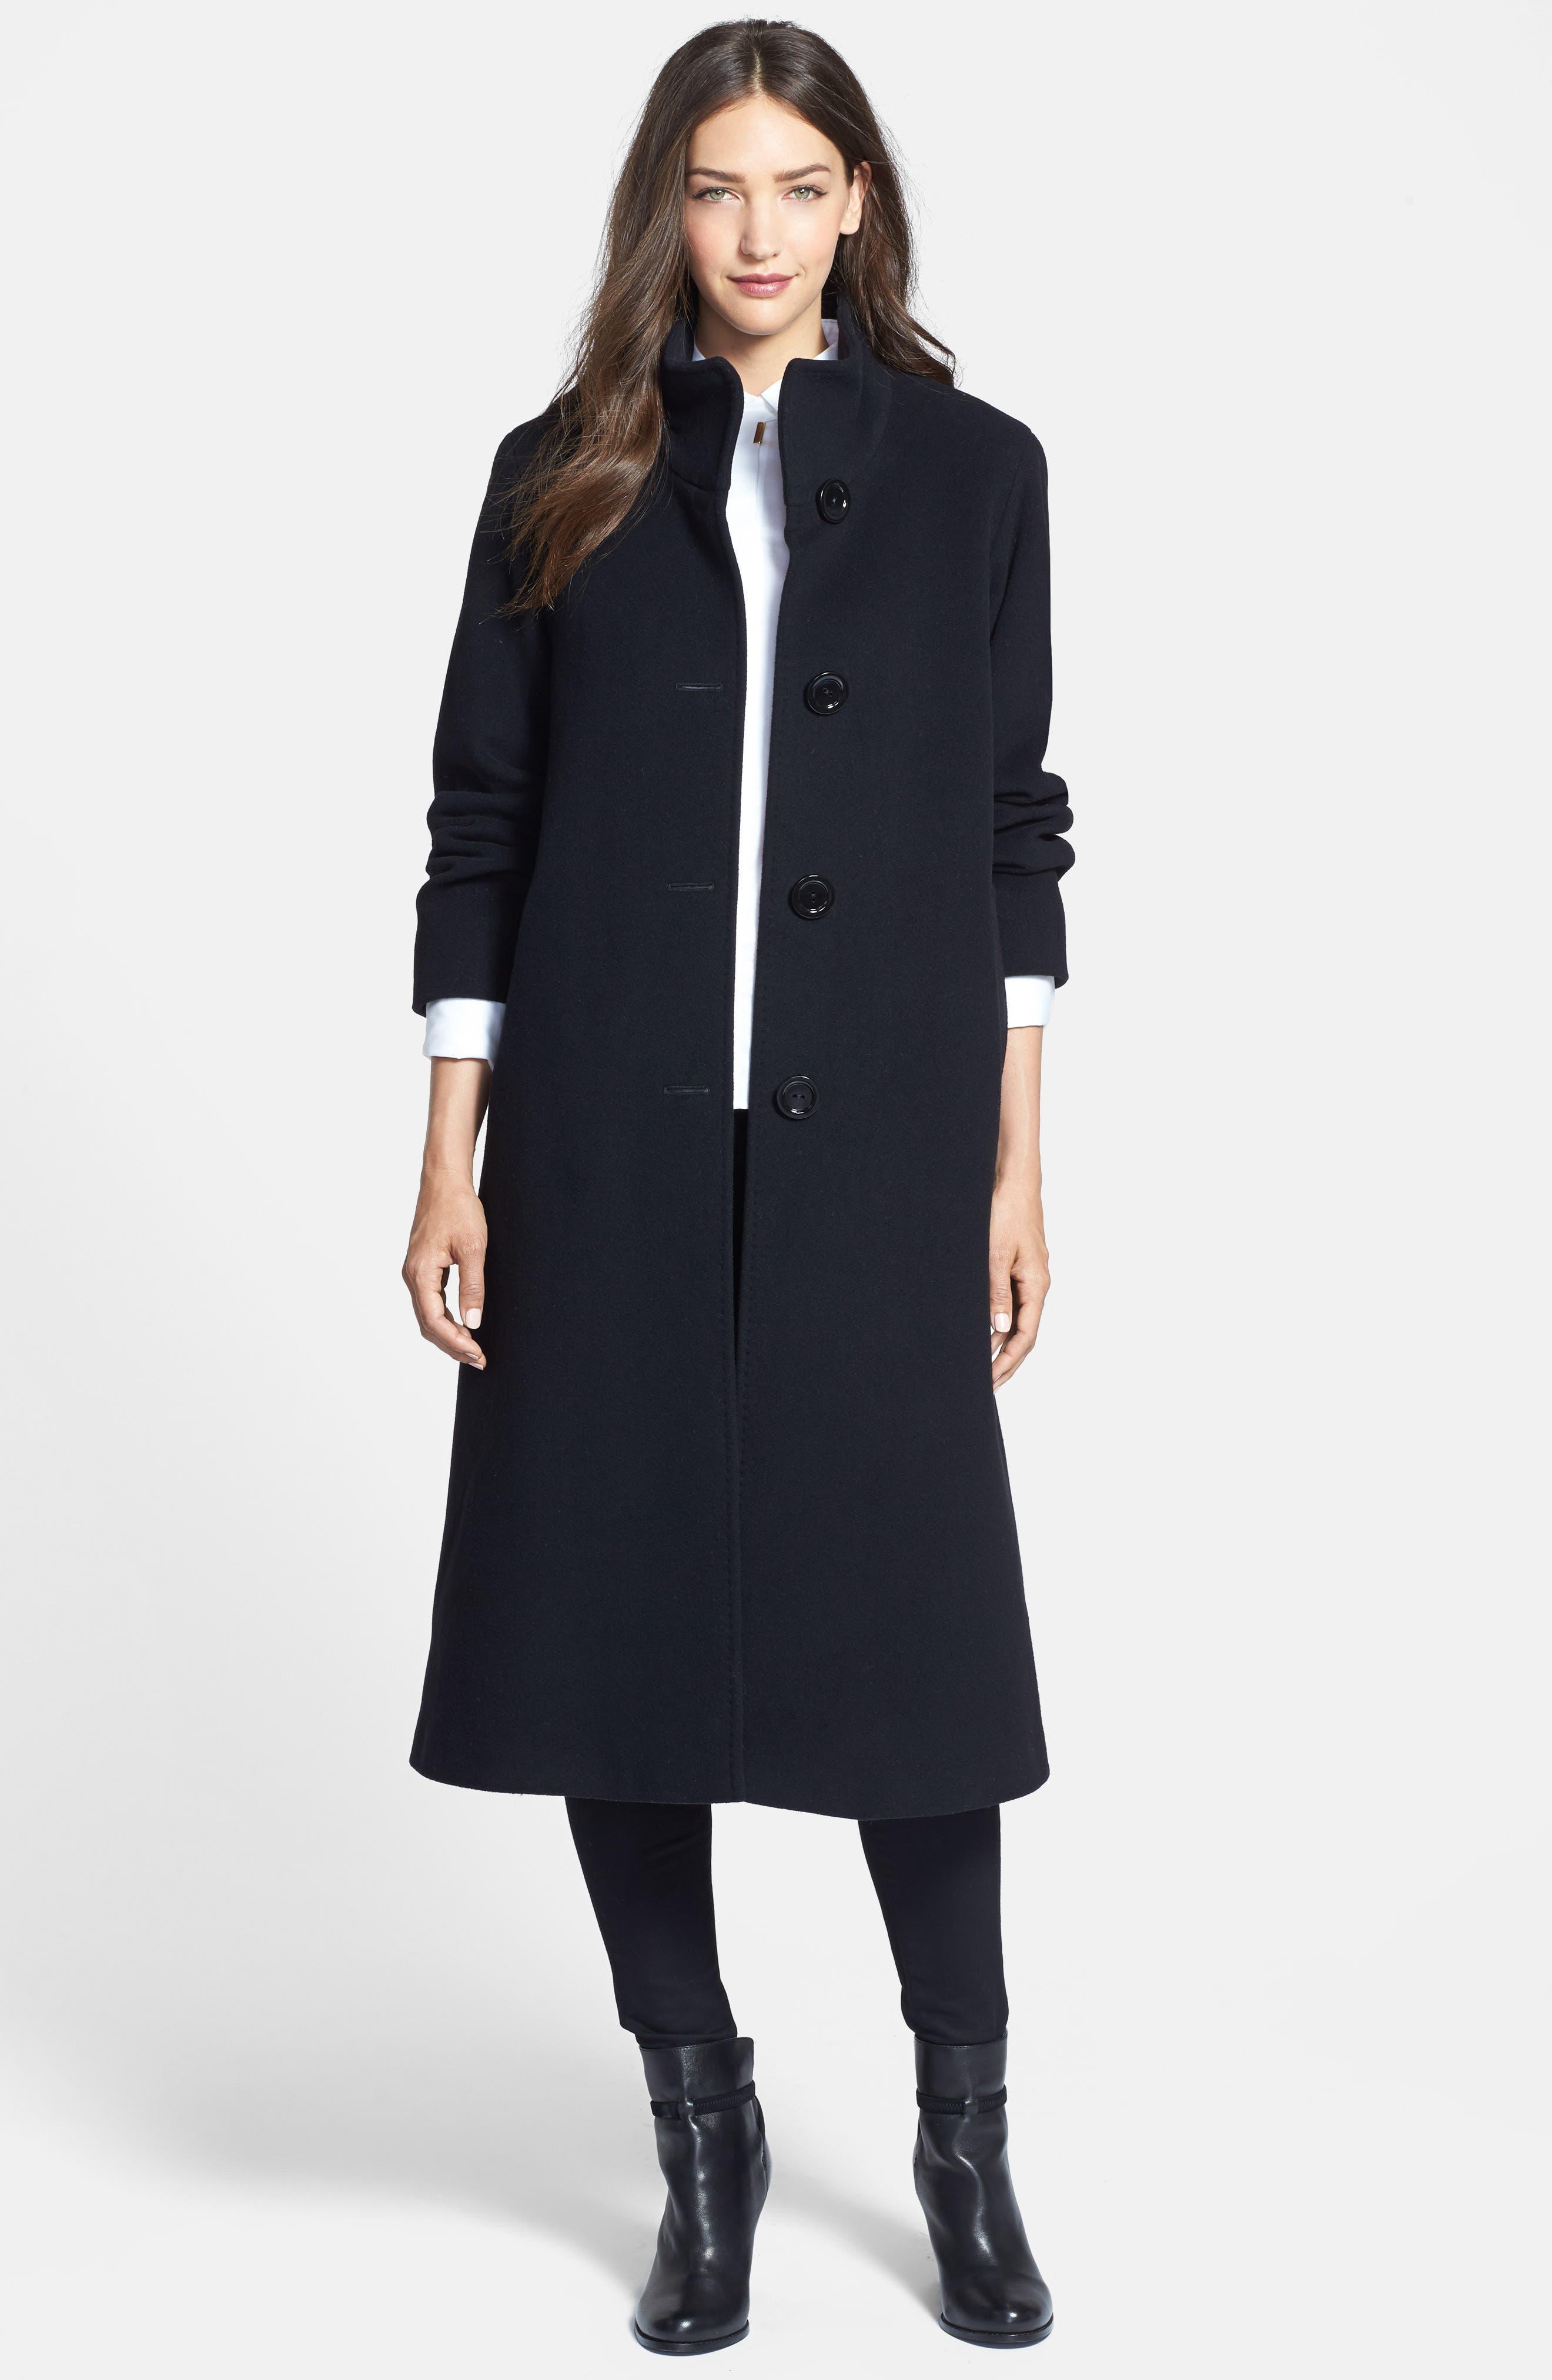 Alternate Image 1 Selected - Cinzia Rocca DUE Stand Collar Side Slit Long Coat (Regular & Petite)